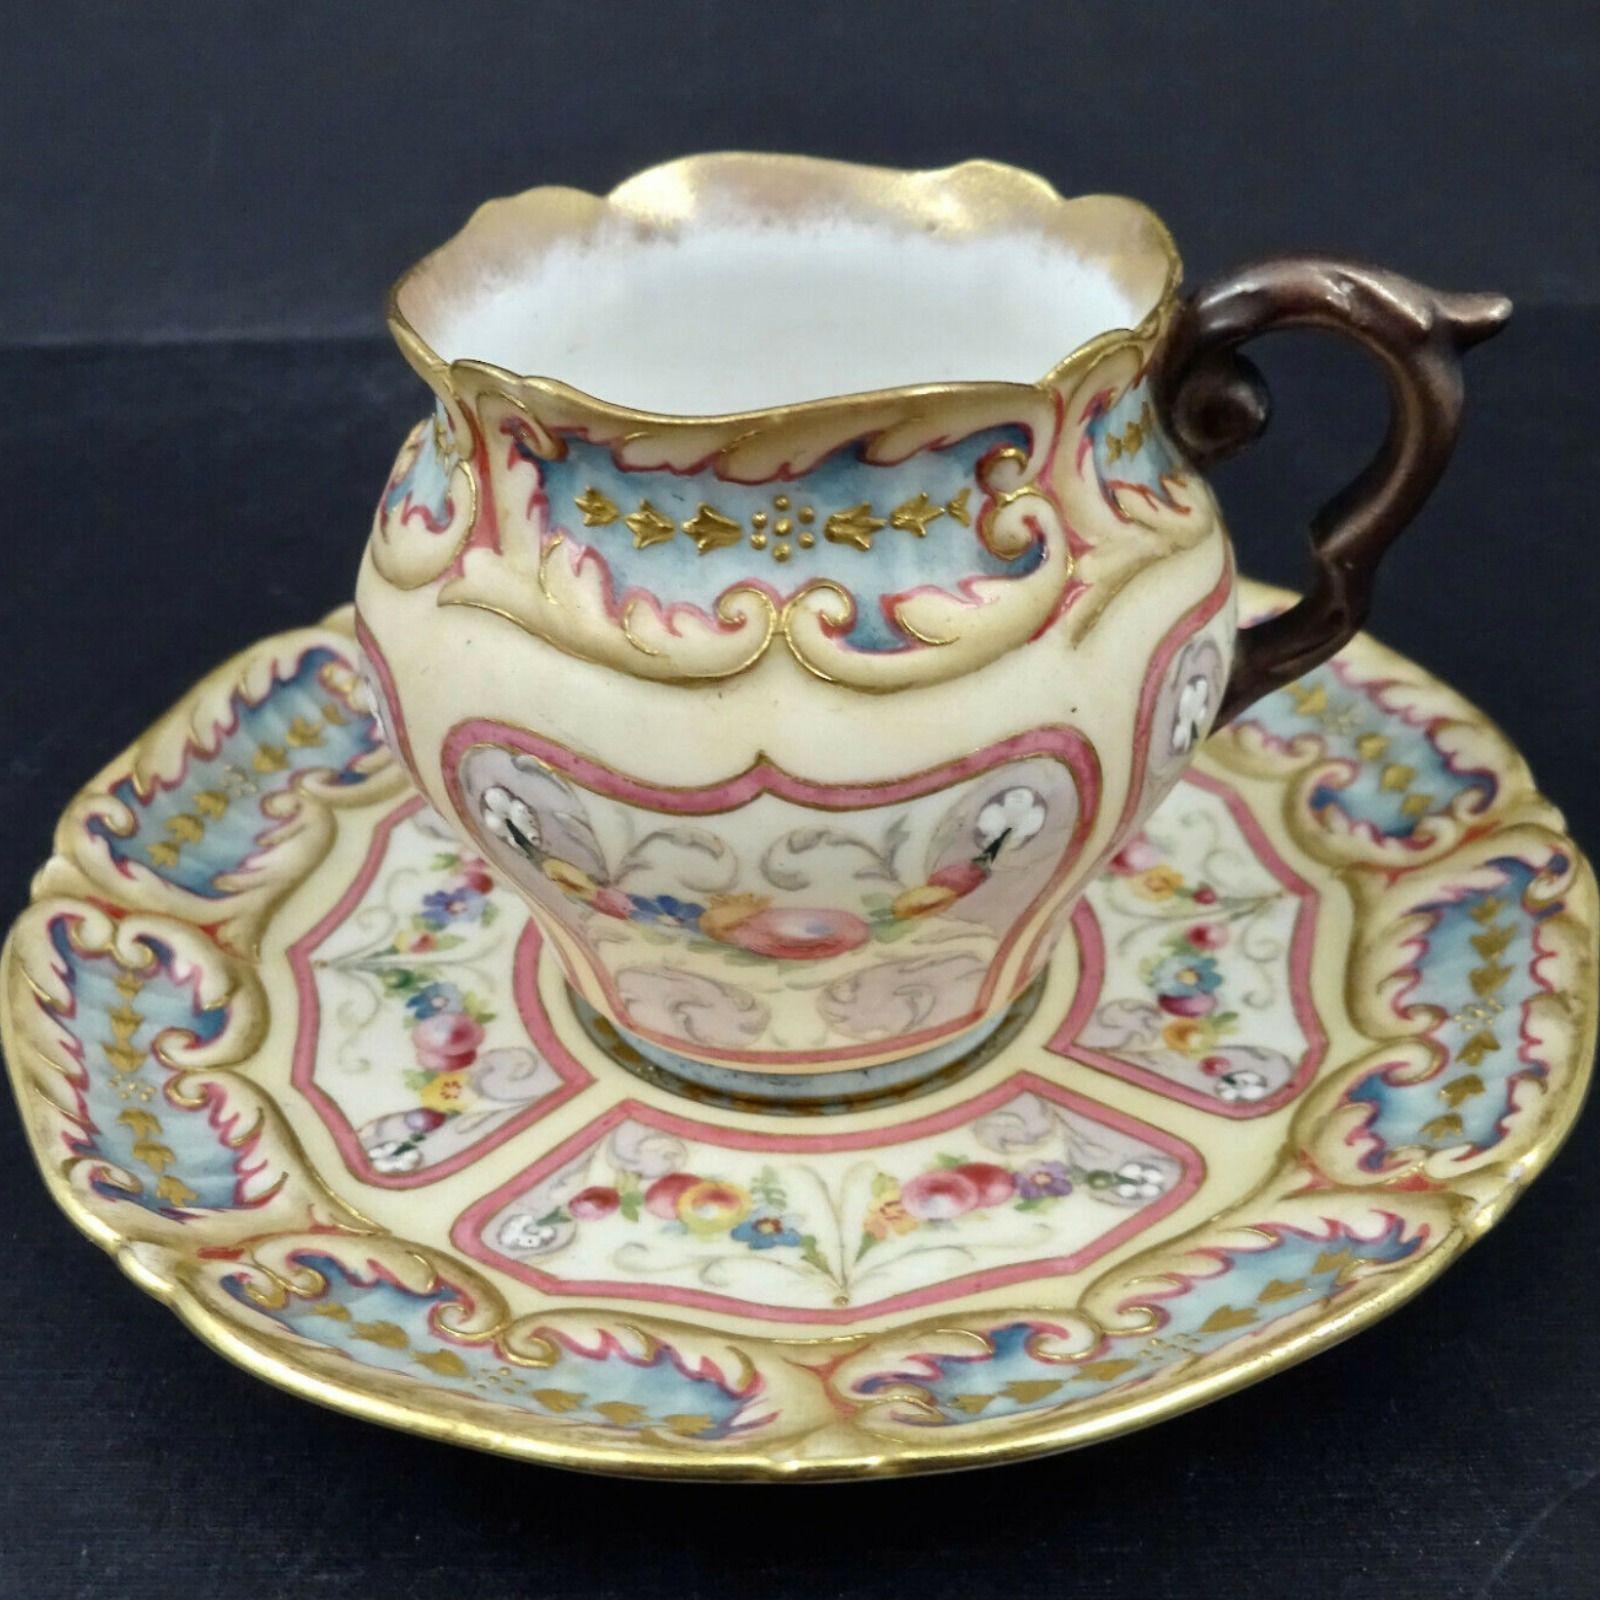 Antique Doulton Burslem Demitasse Cup And Saucer Set Cupsaucer